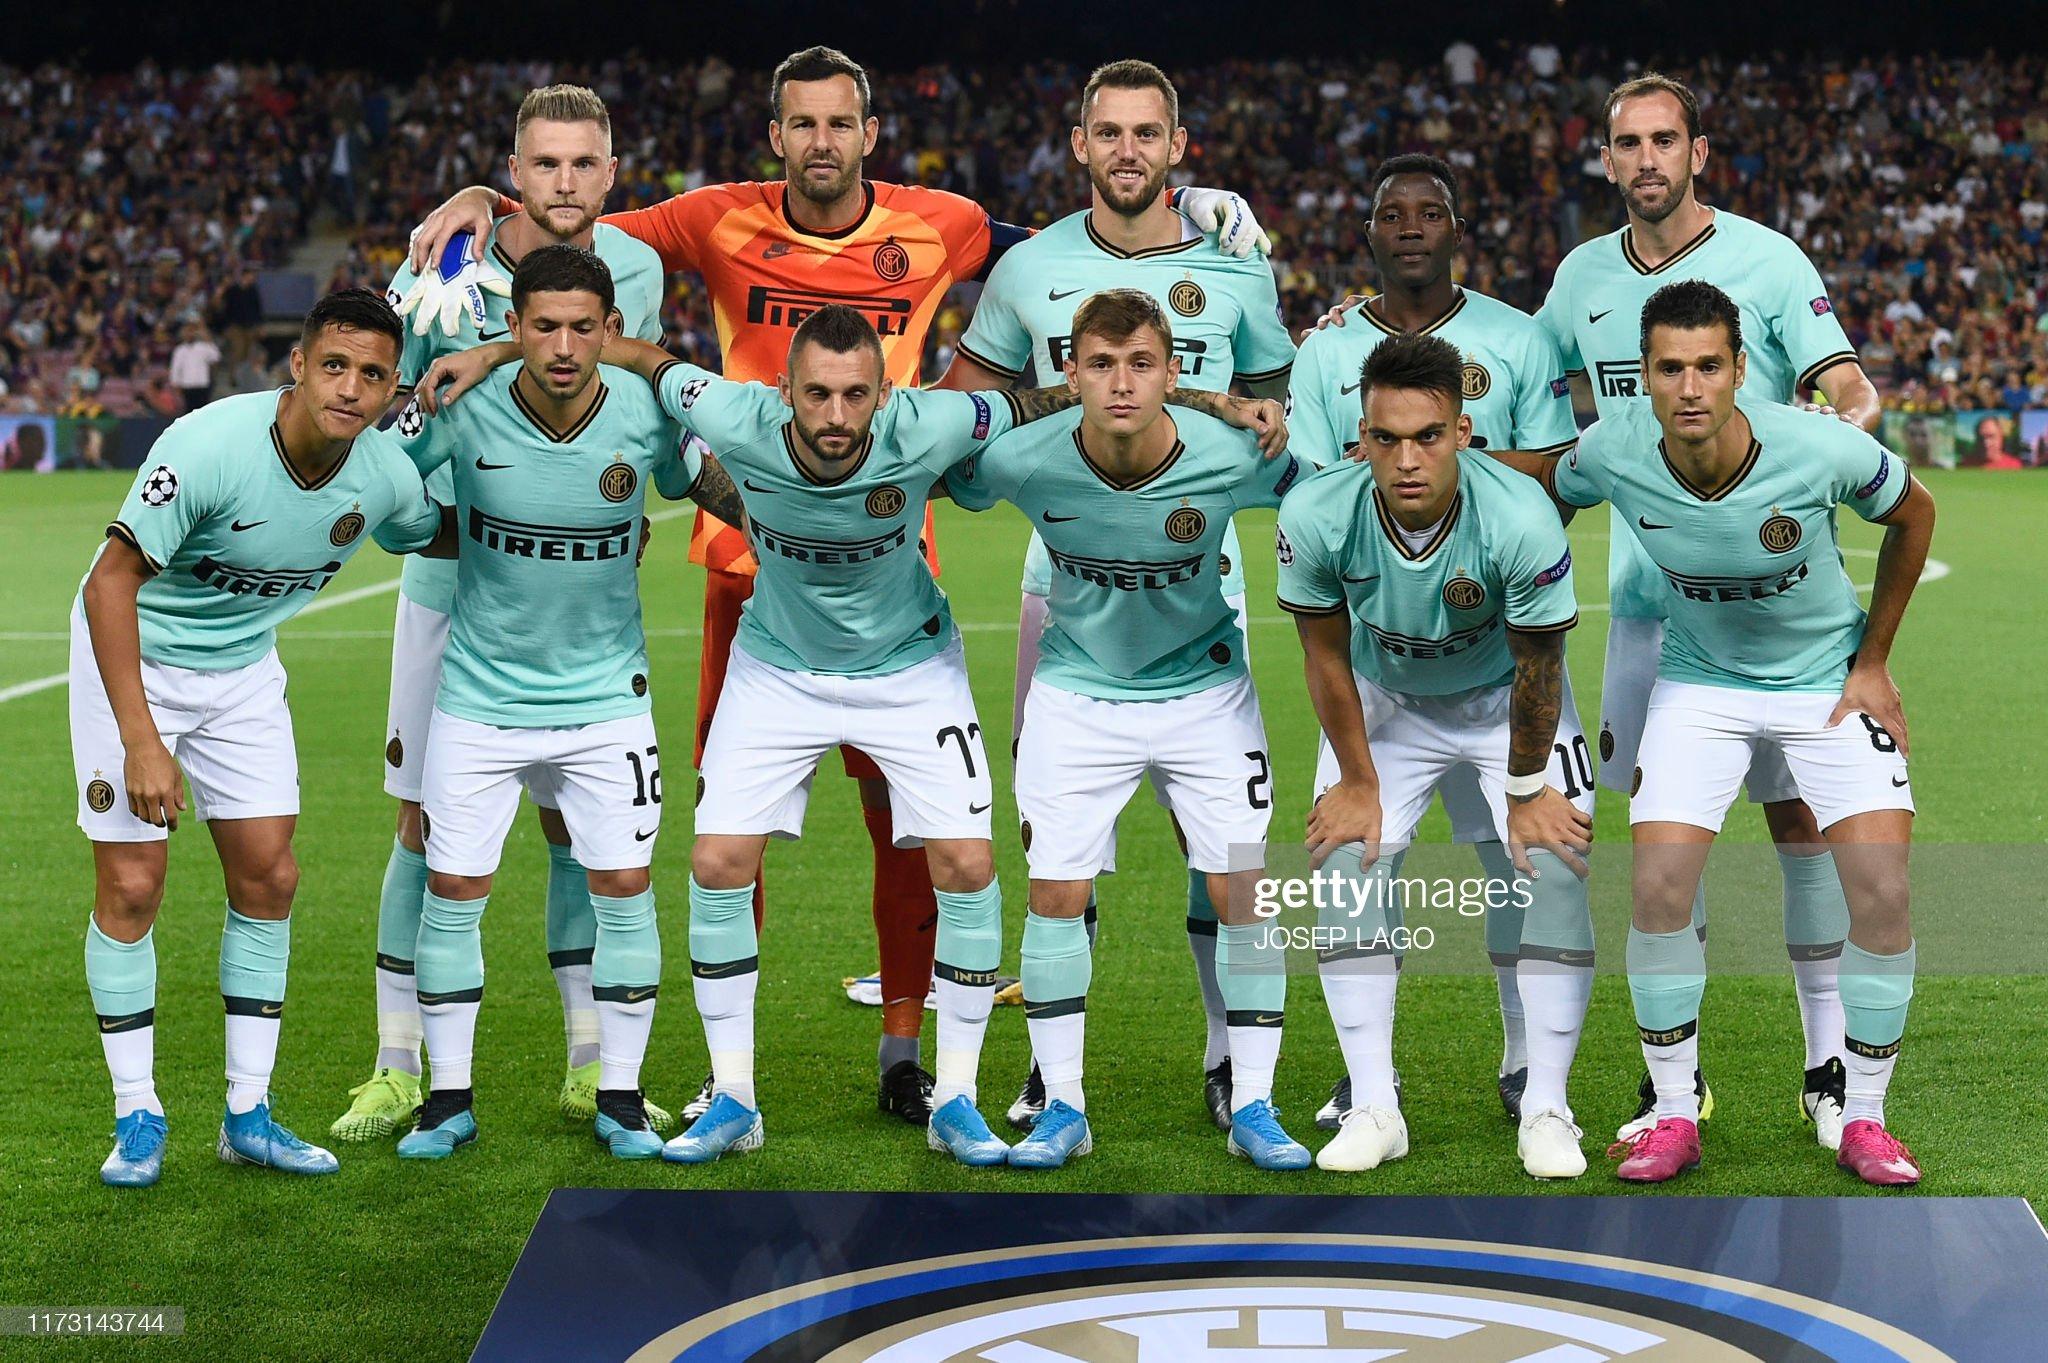 صور مباراة : برشلونة - إنتر 2-1 ( 02-10-2019 )  Inter-milan-players-pose-before-the-uefa-champions-league-group-f-picture-id1173143744?s=2048x2048